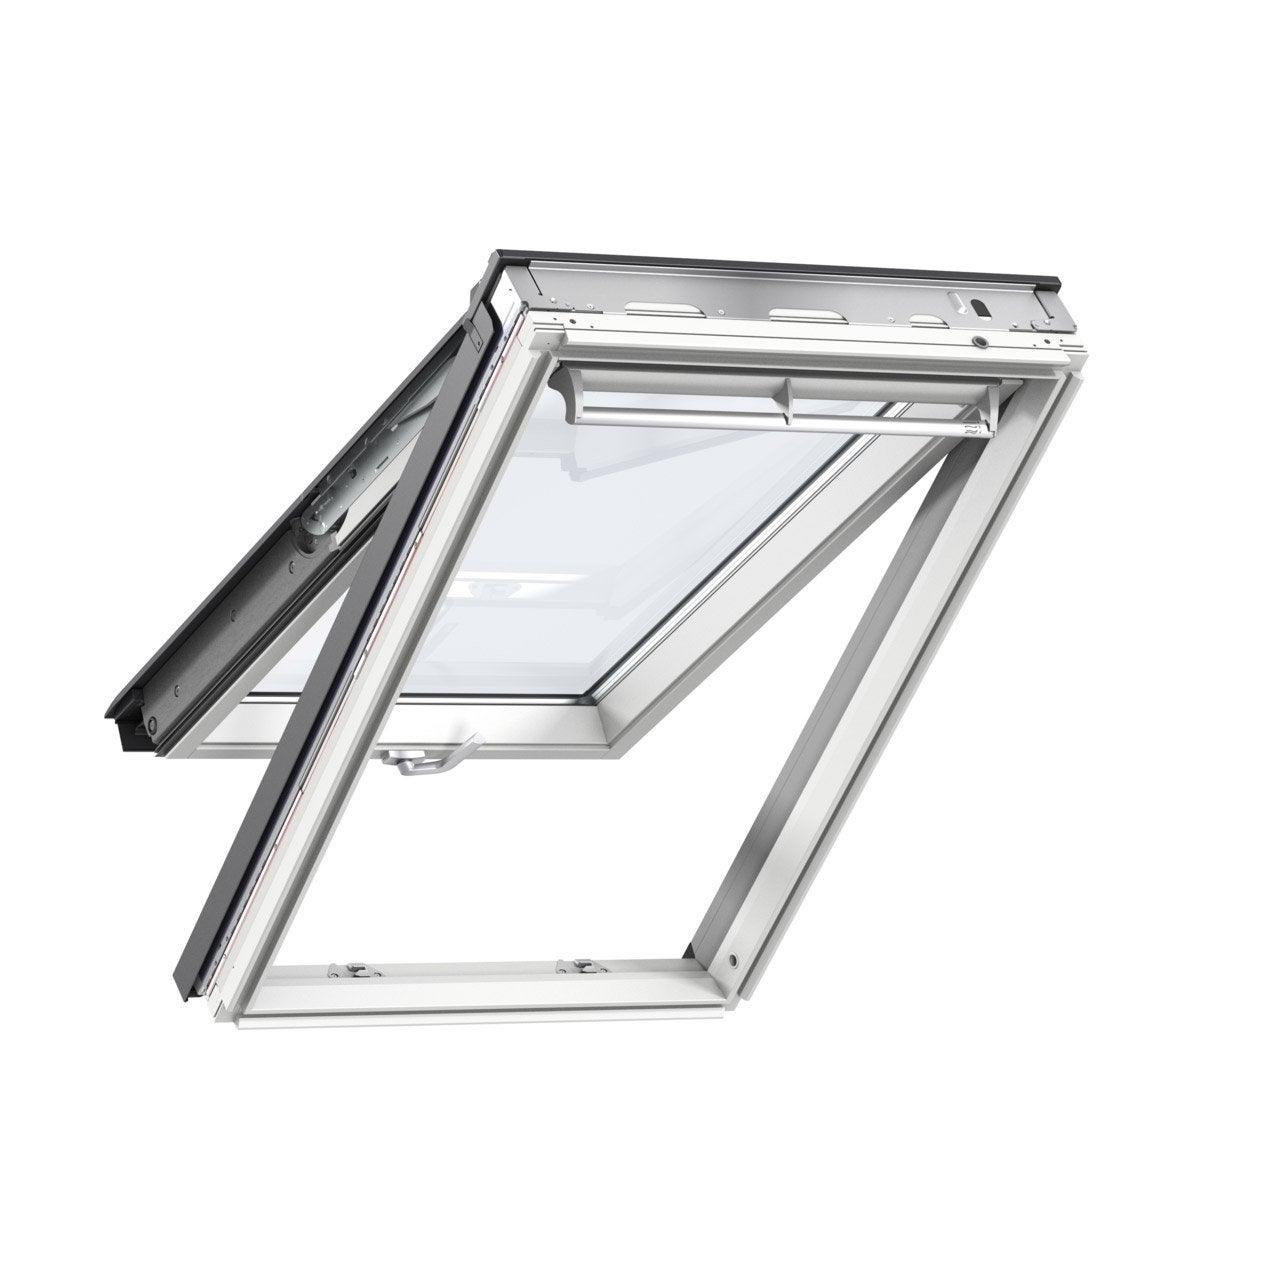 Velux 114 X 118 Confort Everfinish Polyurethane Blanc A Projection